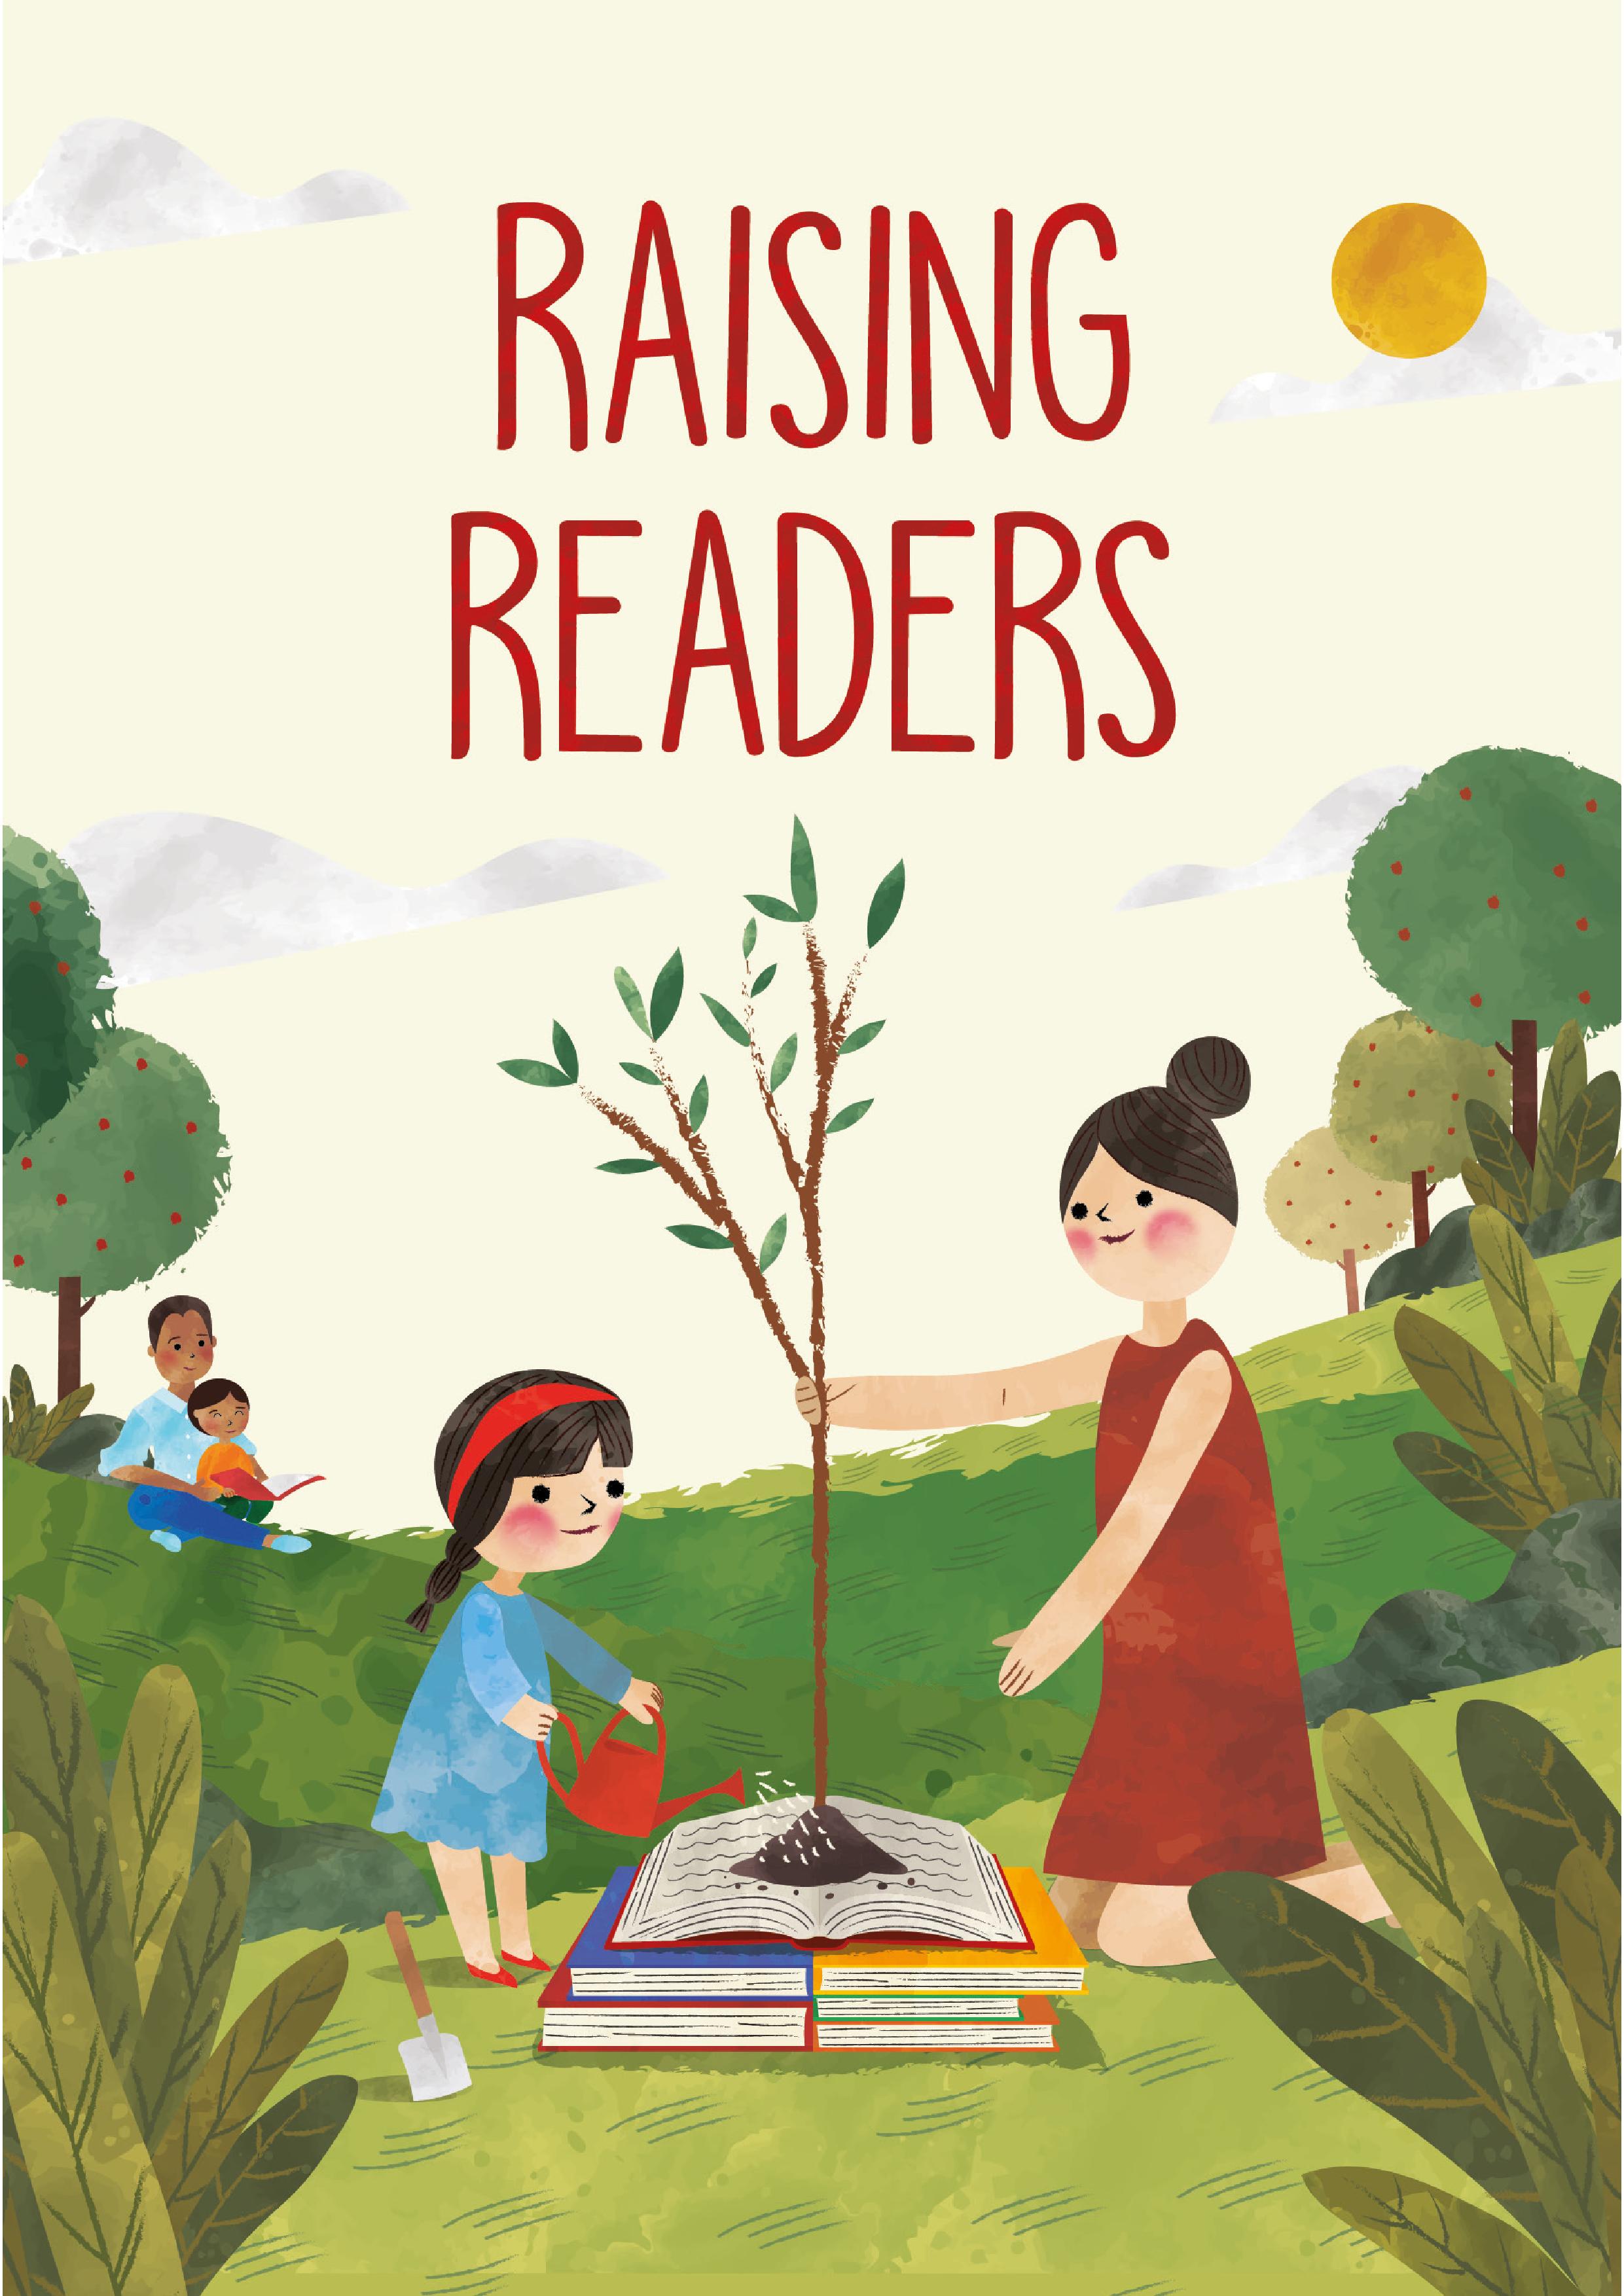 Raising readers image